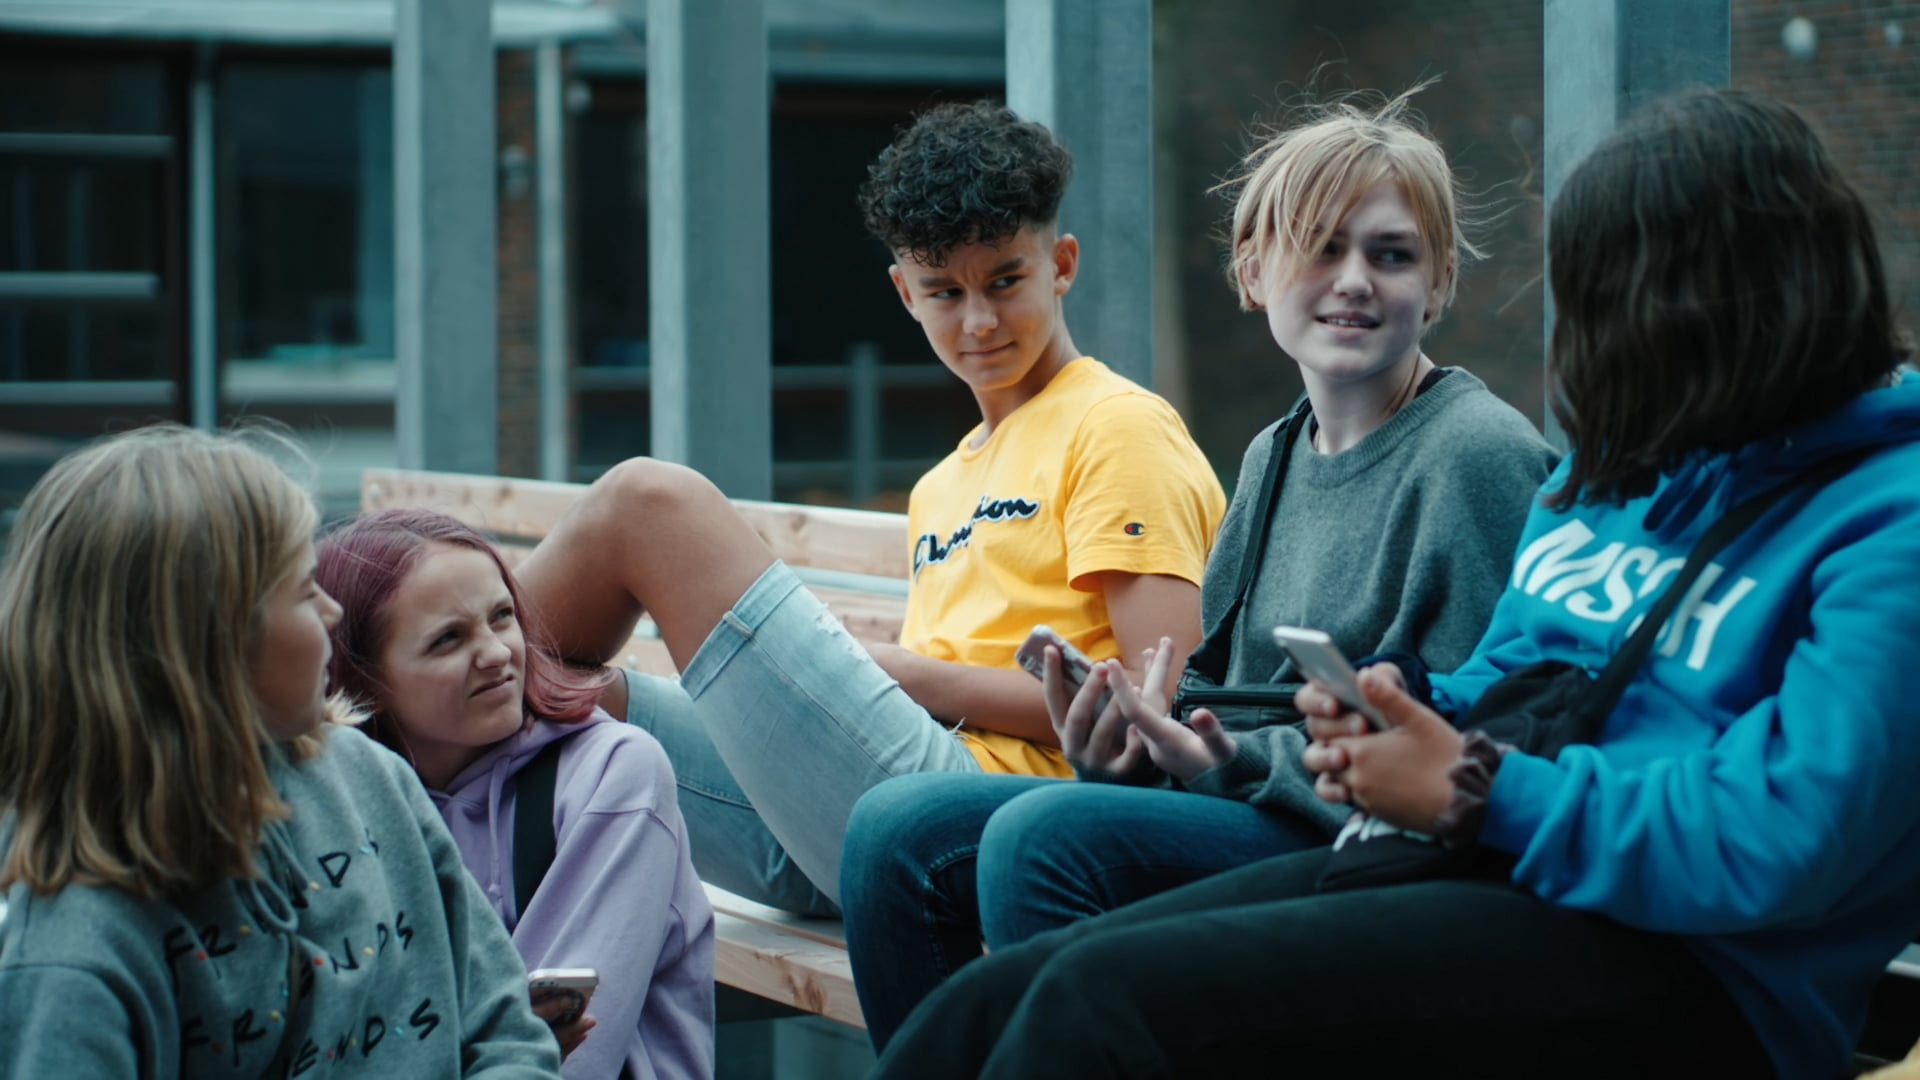 Chris Macdonald S.T.U.P.I.D kampagnefilm - Just Human